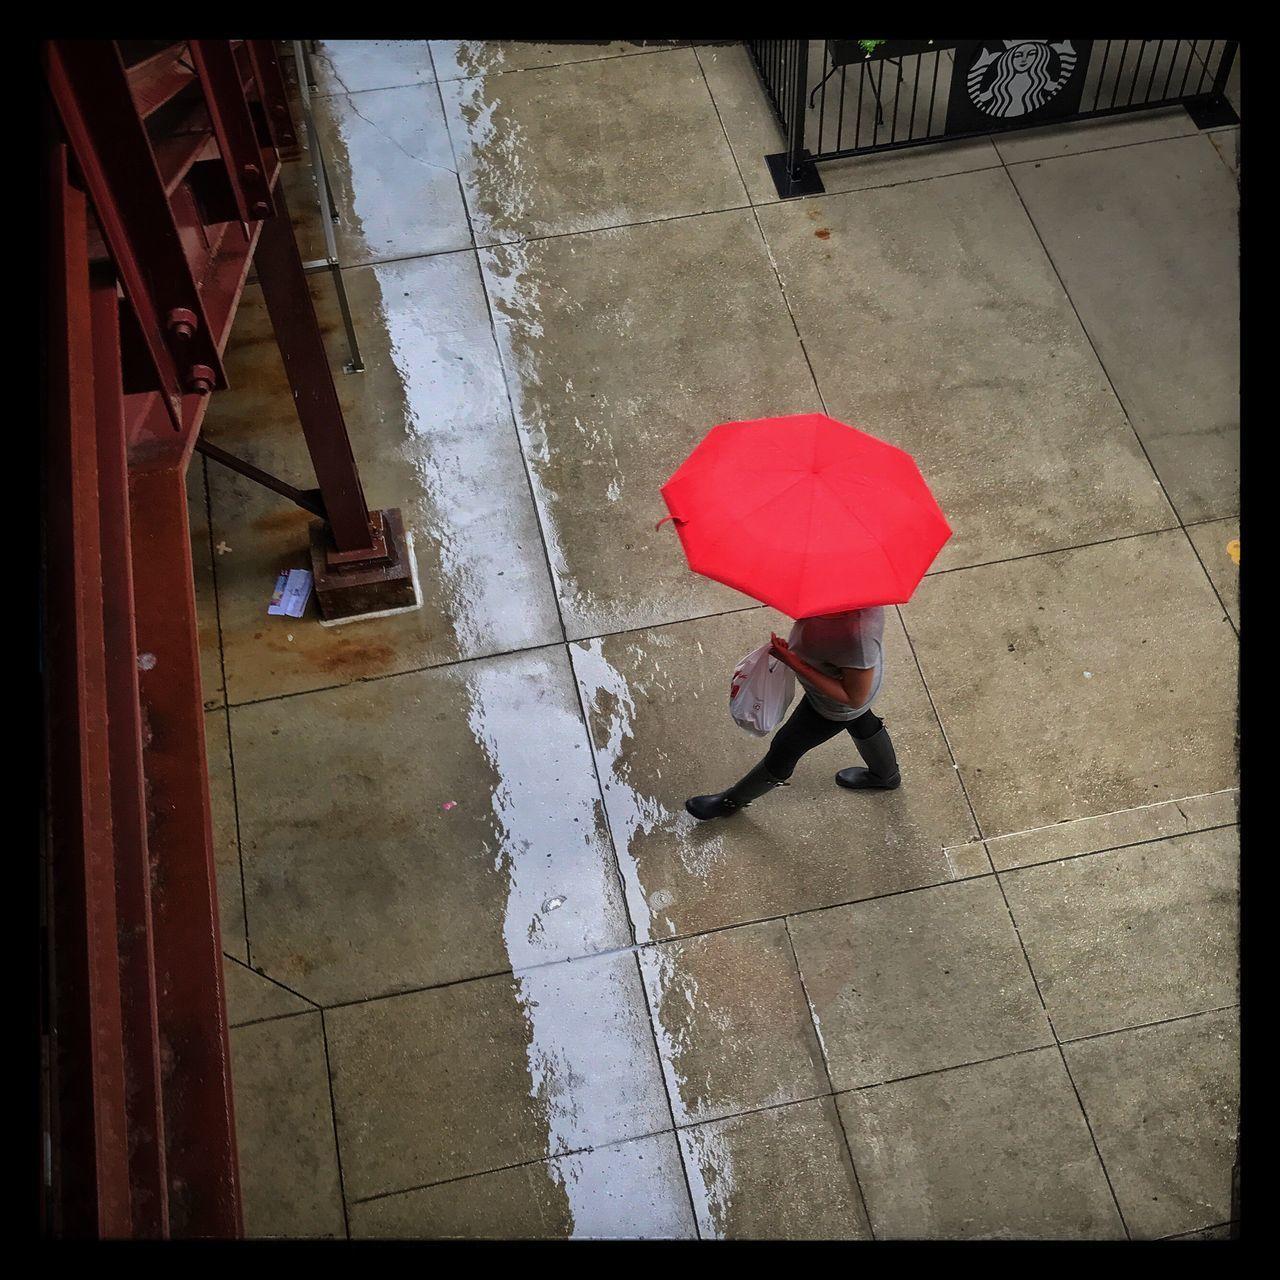 Umbrella Rain Chicago Streetphotography